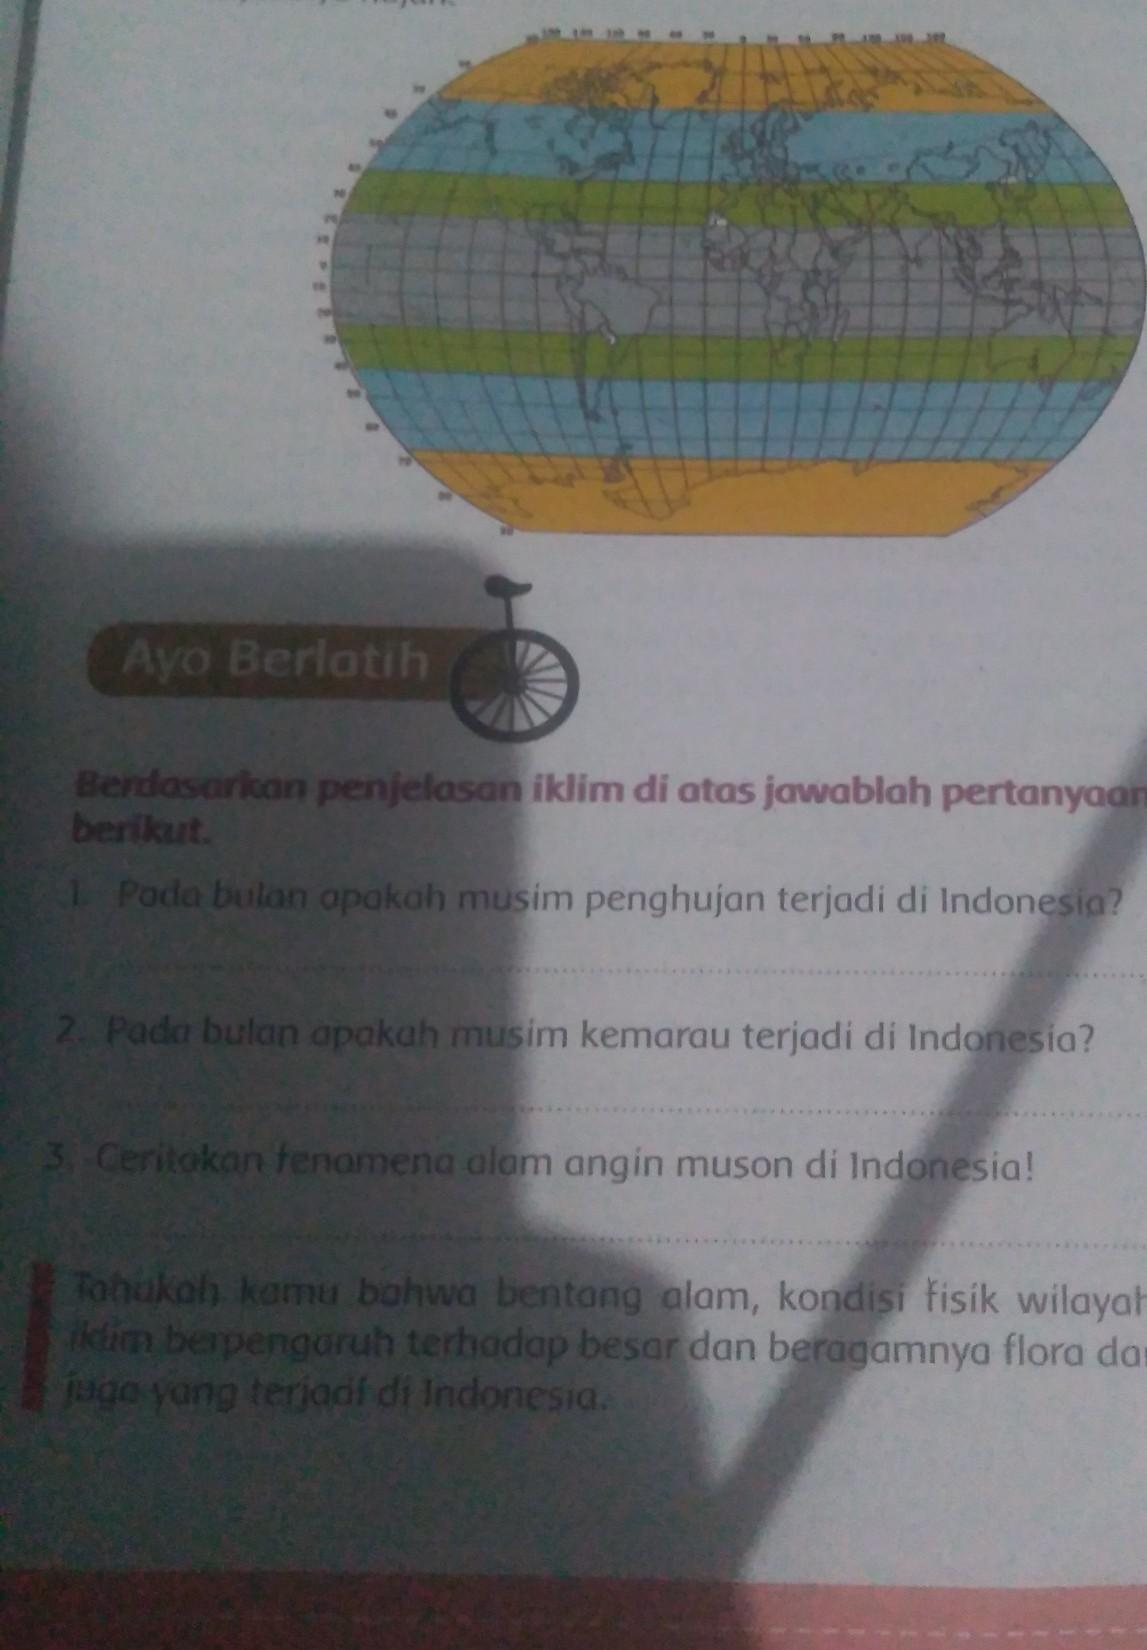 Pada Bulan Apakah Musim Penghujan Terjadi Di Indonesia : bulan, apakah, musim, penghujan, terjadi, indonesia, Bulan, Apakah, Musim, Hujan, Terjadi, Indonesia2., Kemarau, Brainly.co.id